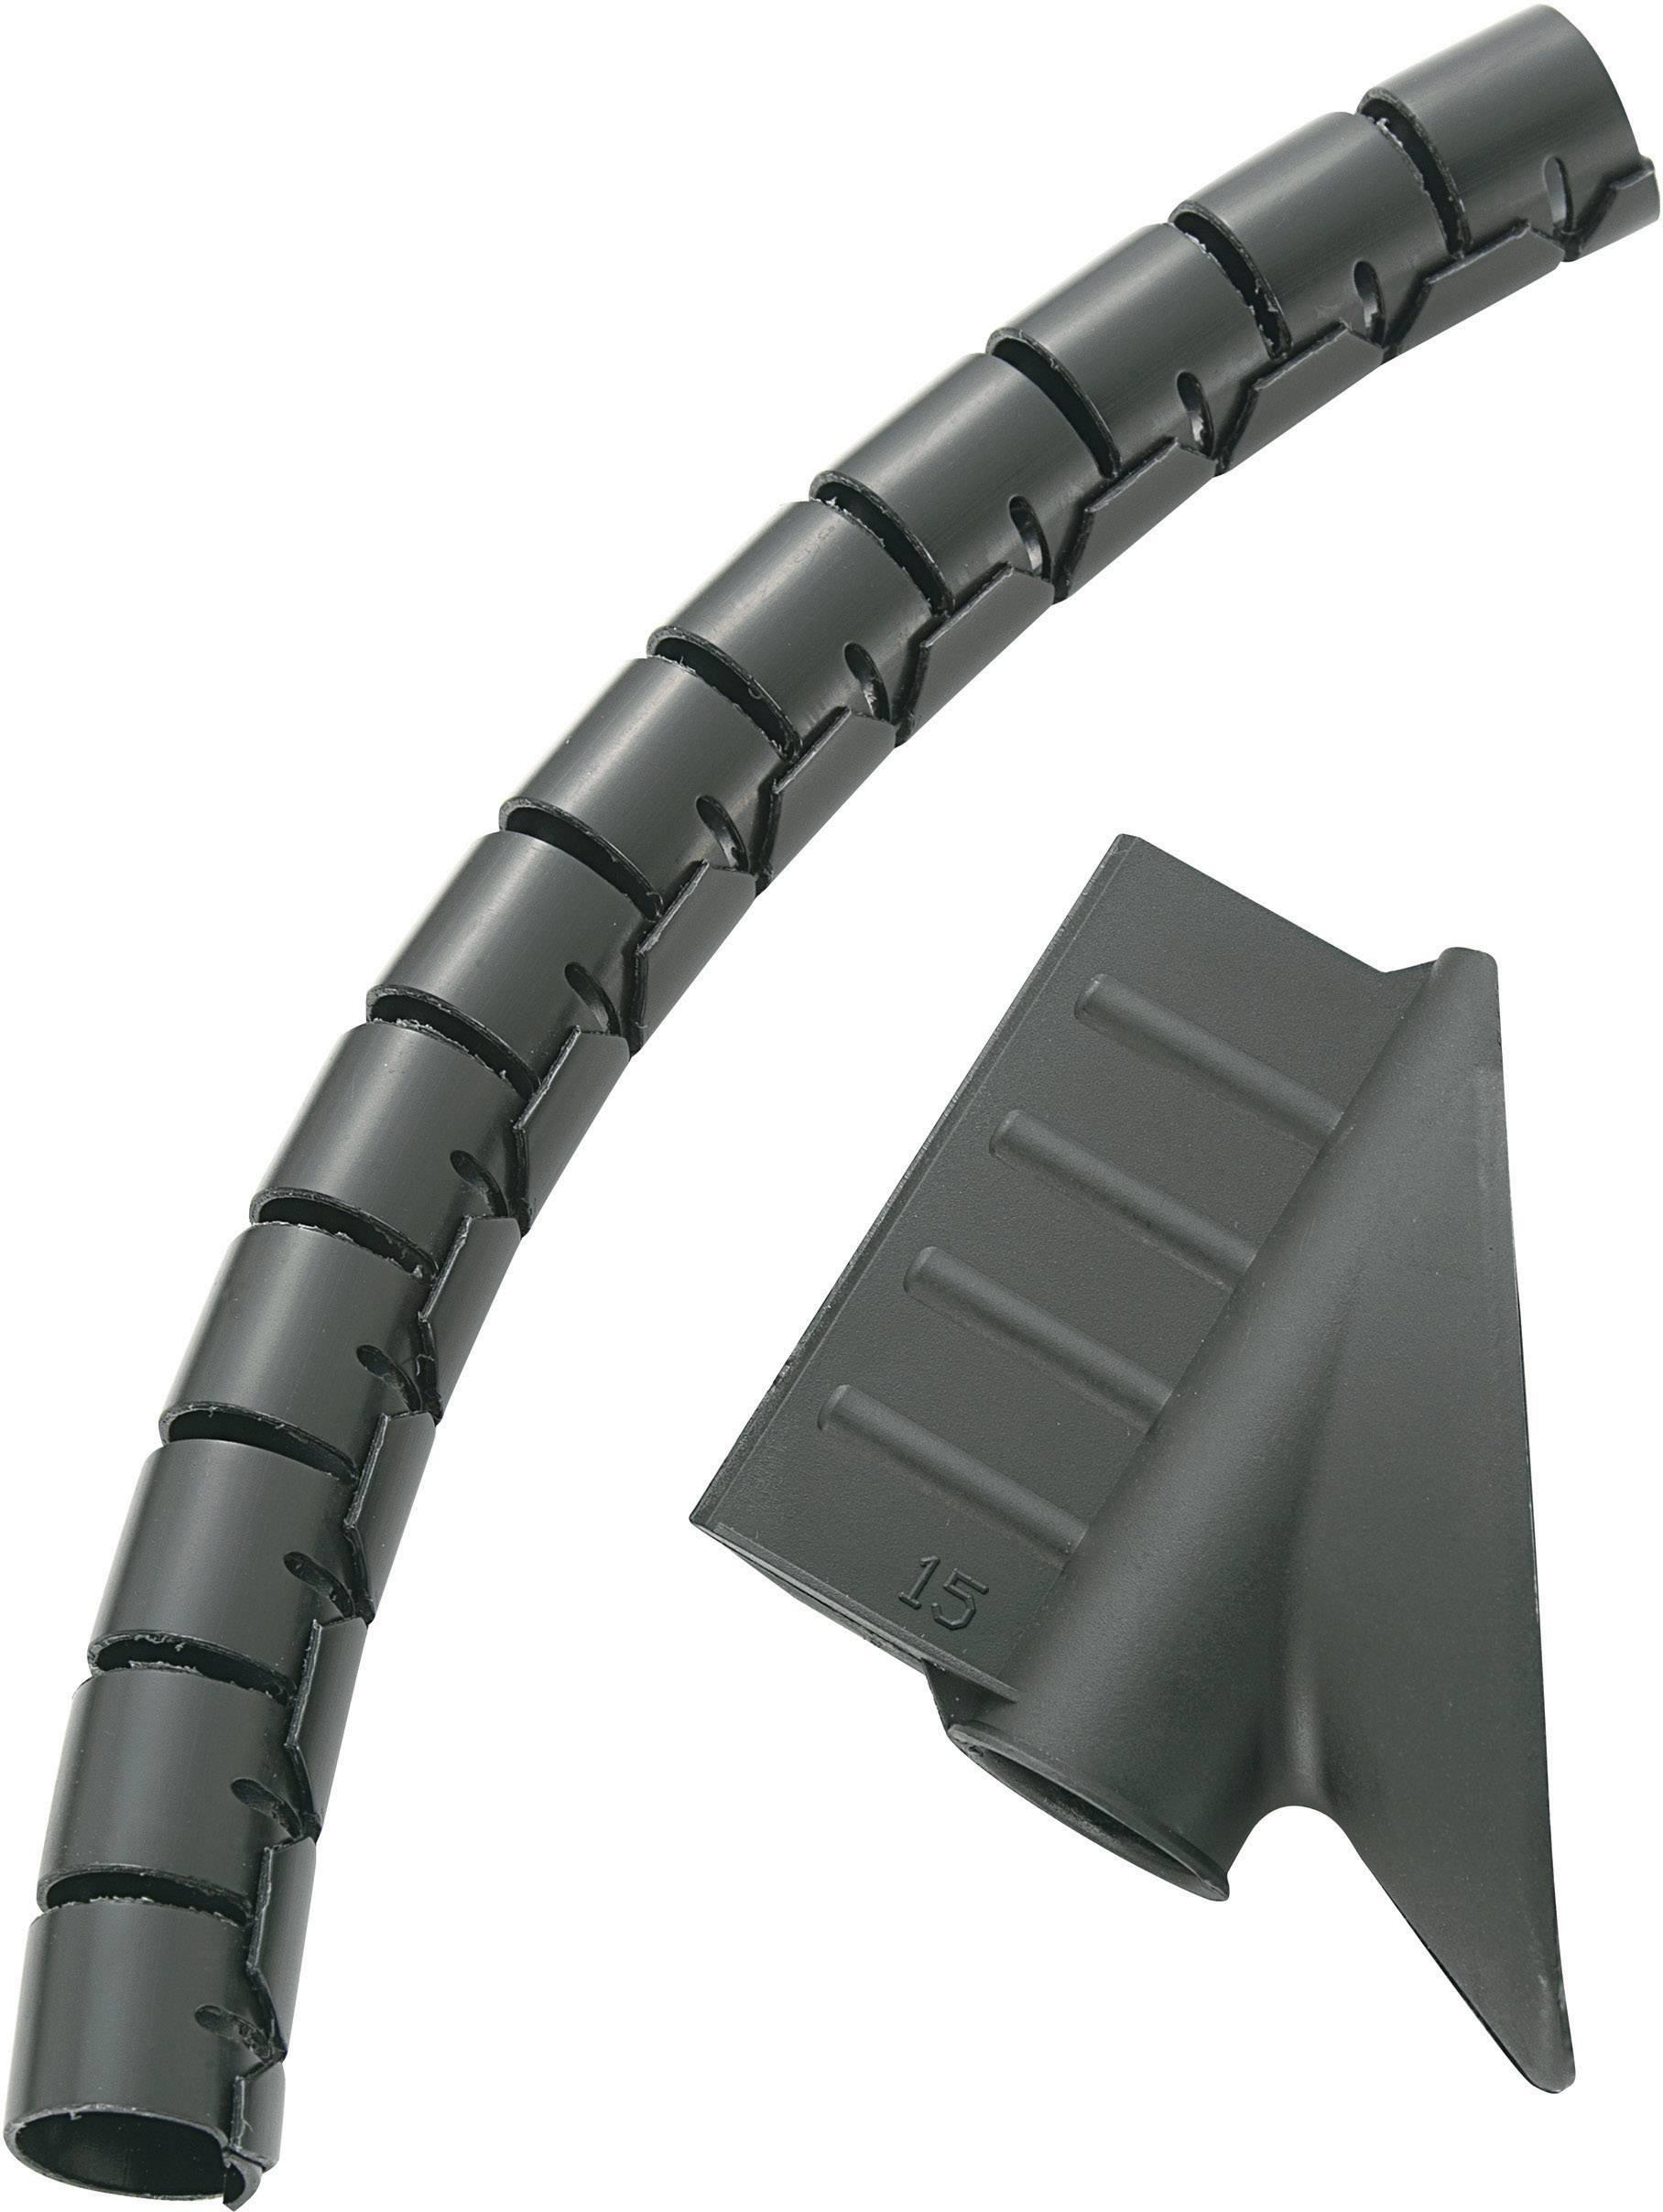 Káblový oplet KSS MX-KLT20SL, 20 mm (max), 5 m, strieborná